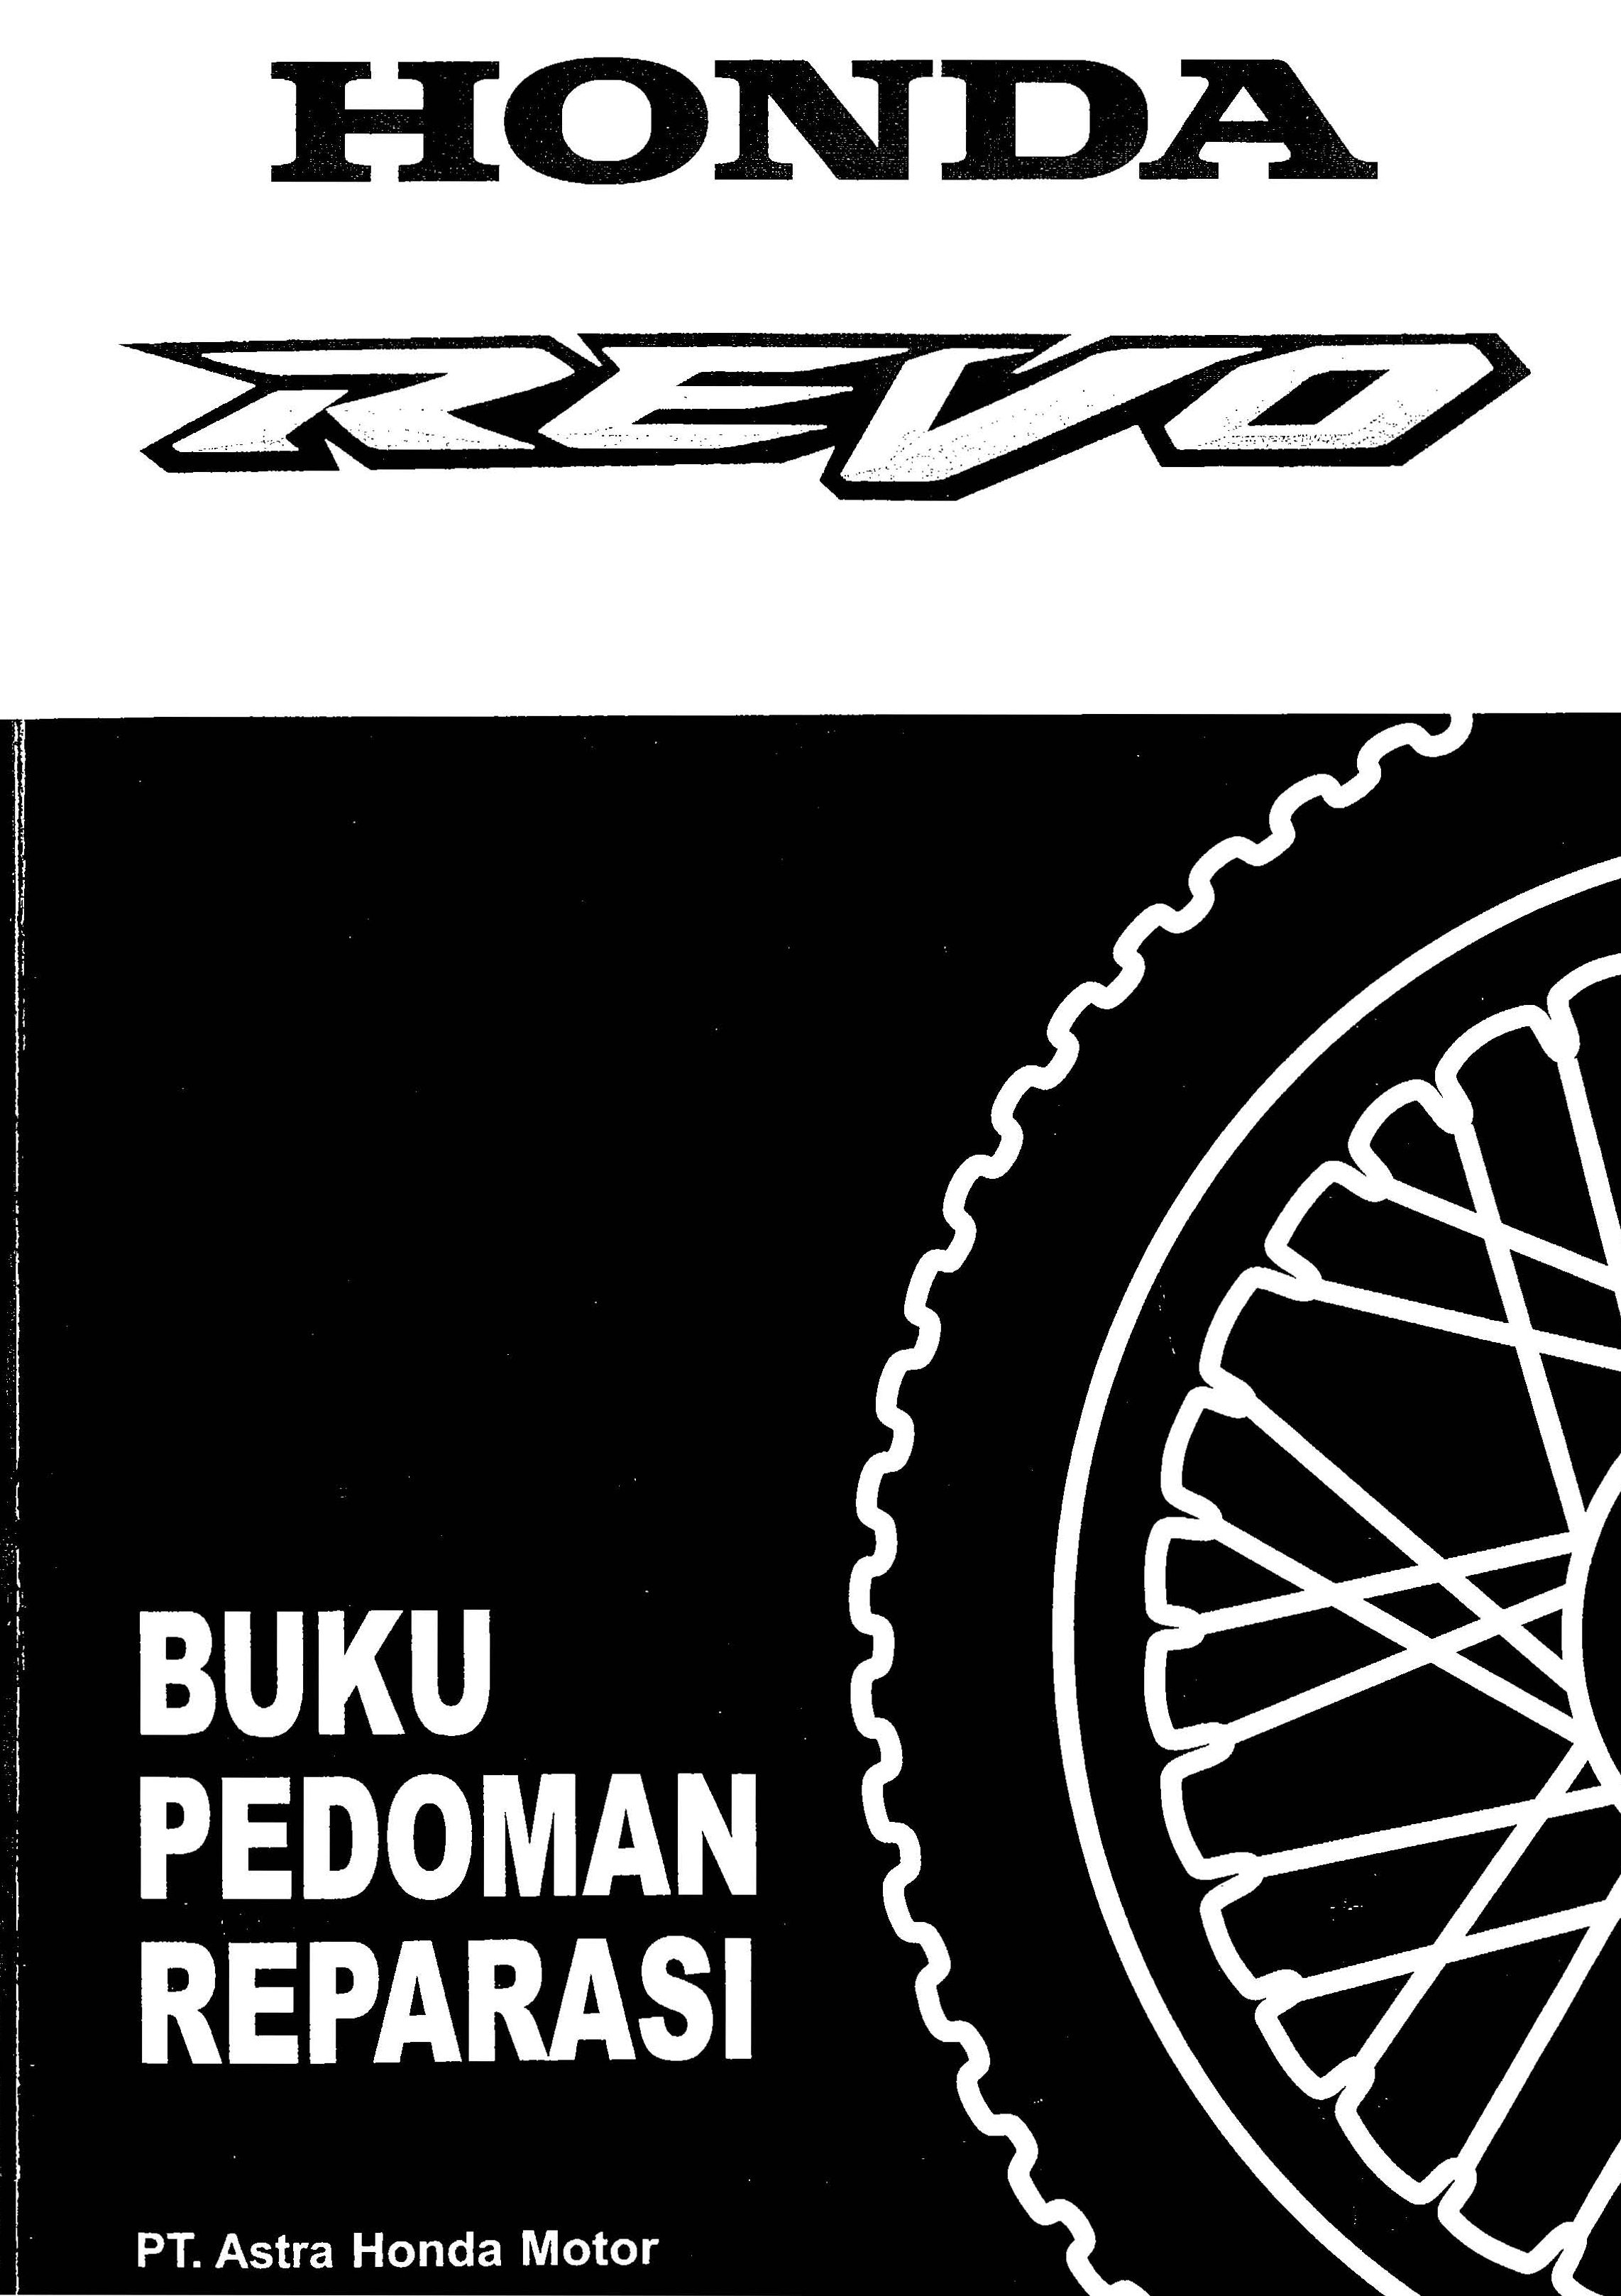 Workshop manual for Honda Revo (Indonesian) (2009)